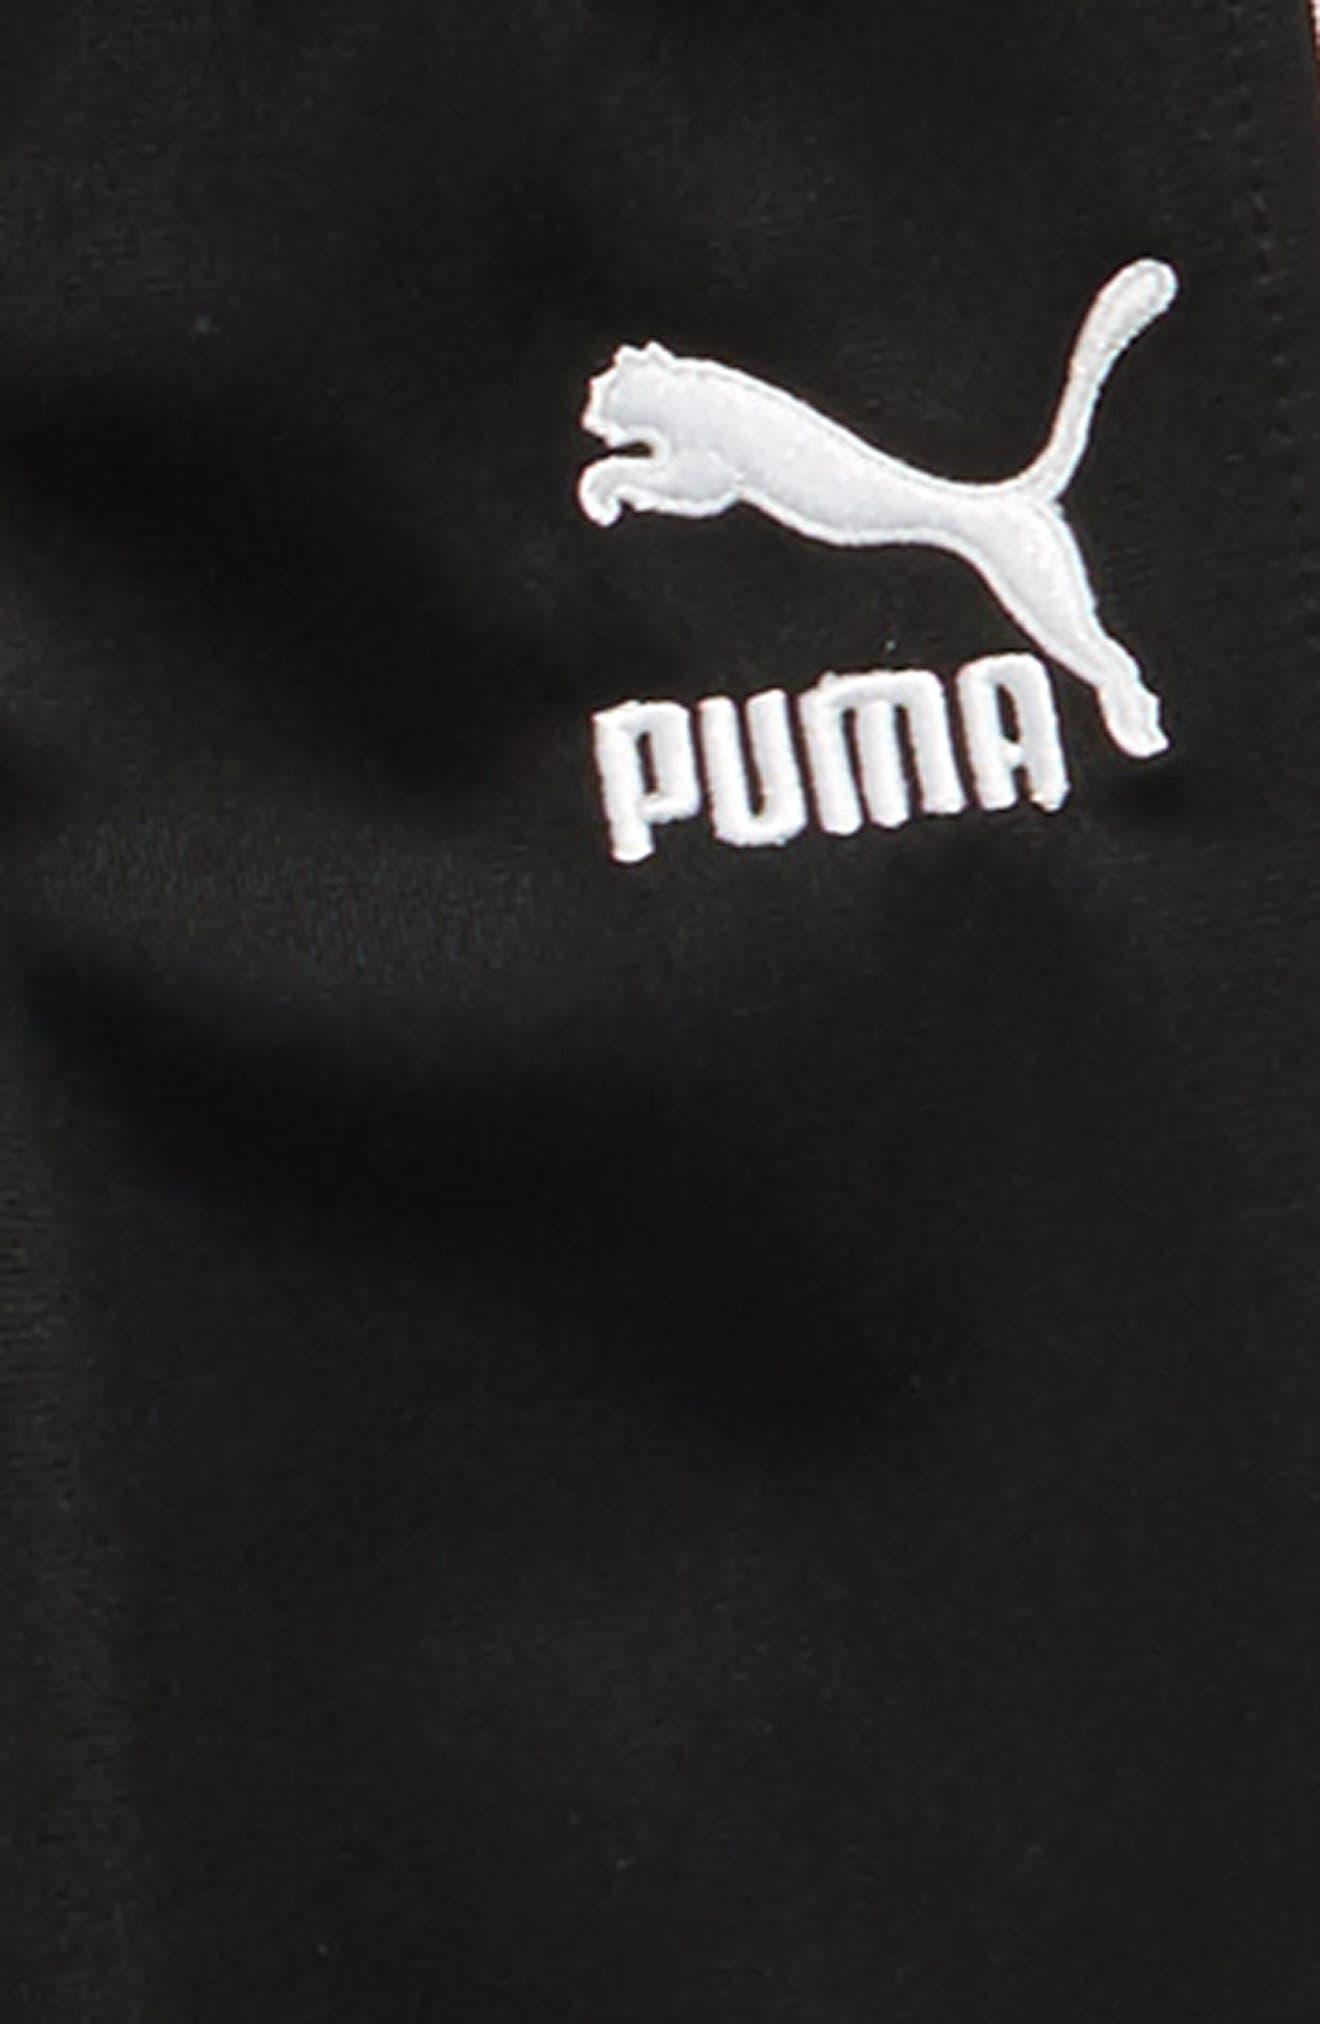 Alternate Image 2  - PUMA Jacket & Sweatpants Set (Toddler Boys & Little Boys)